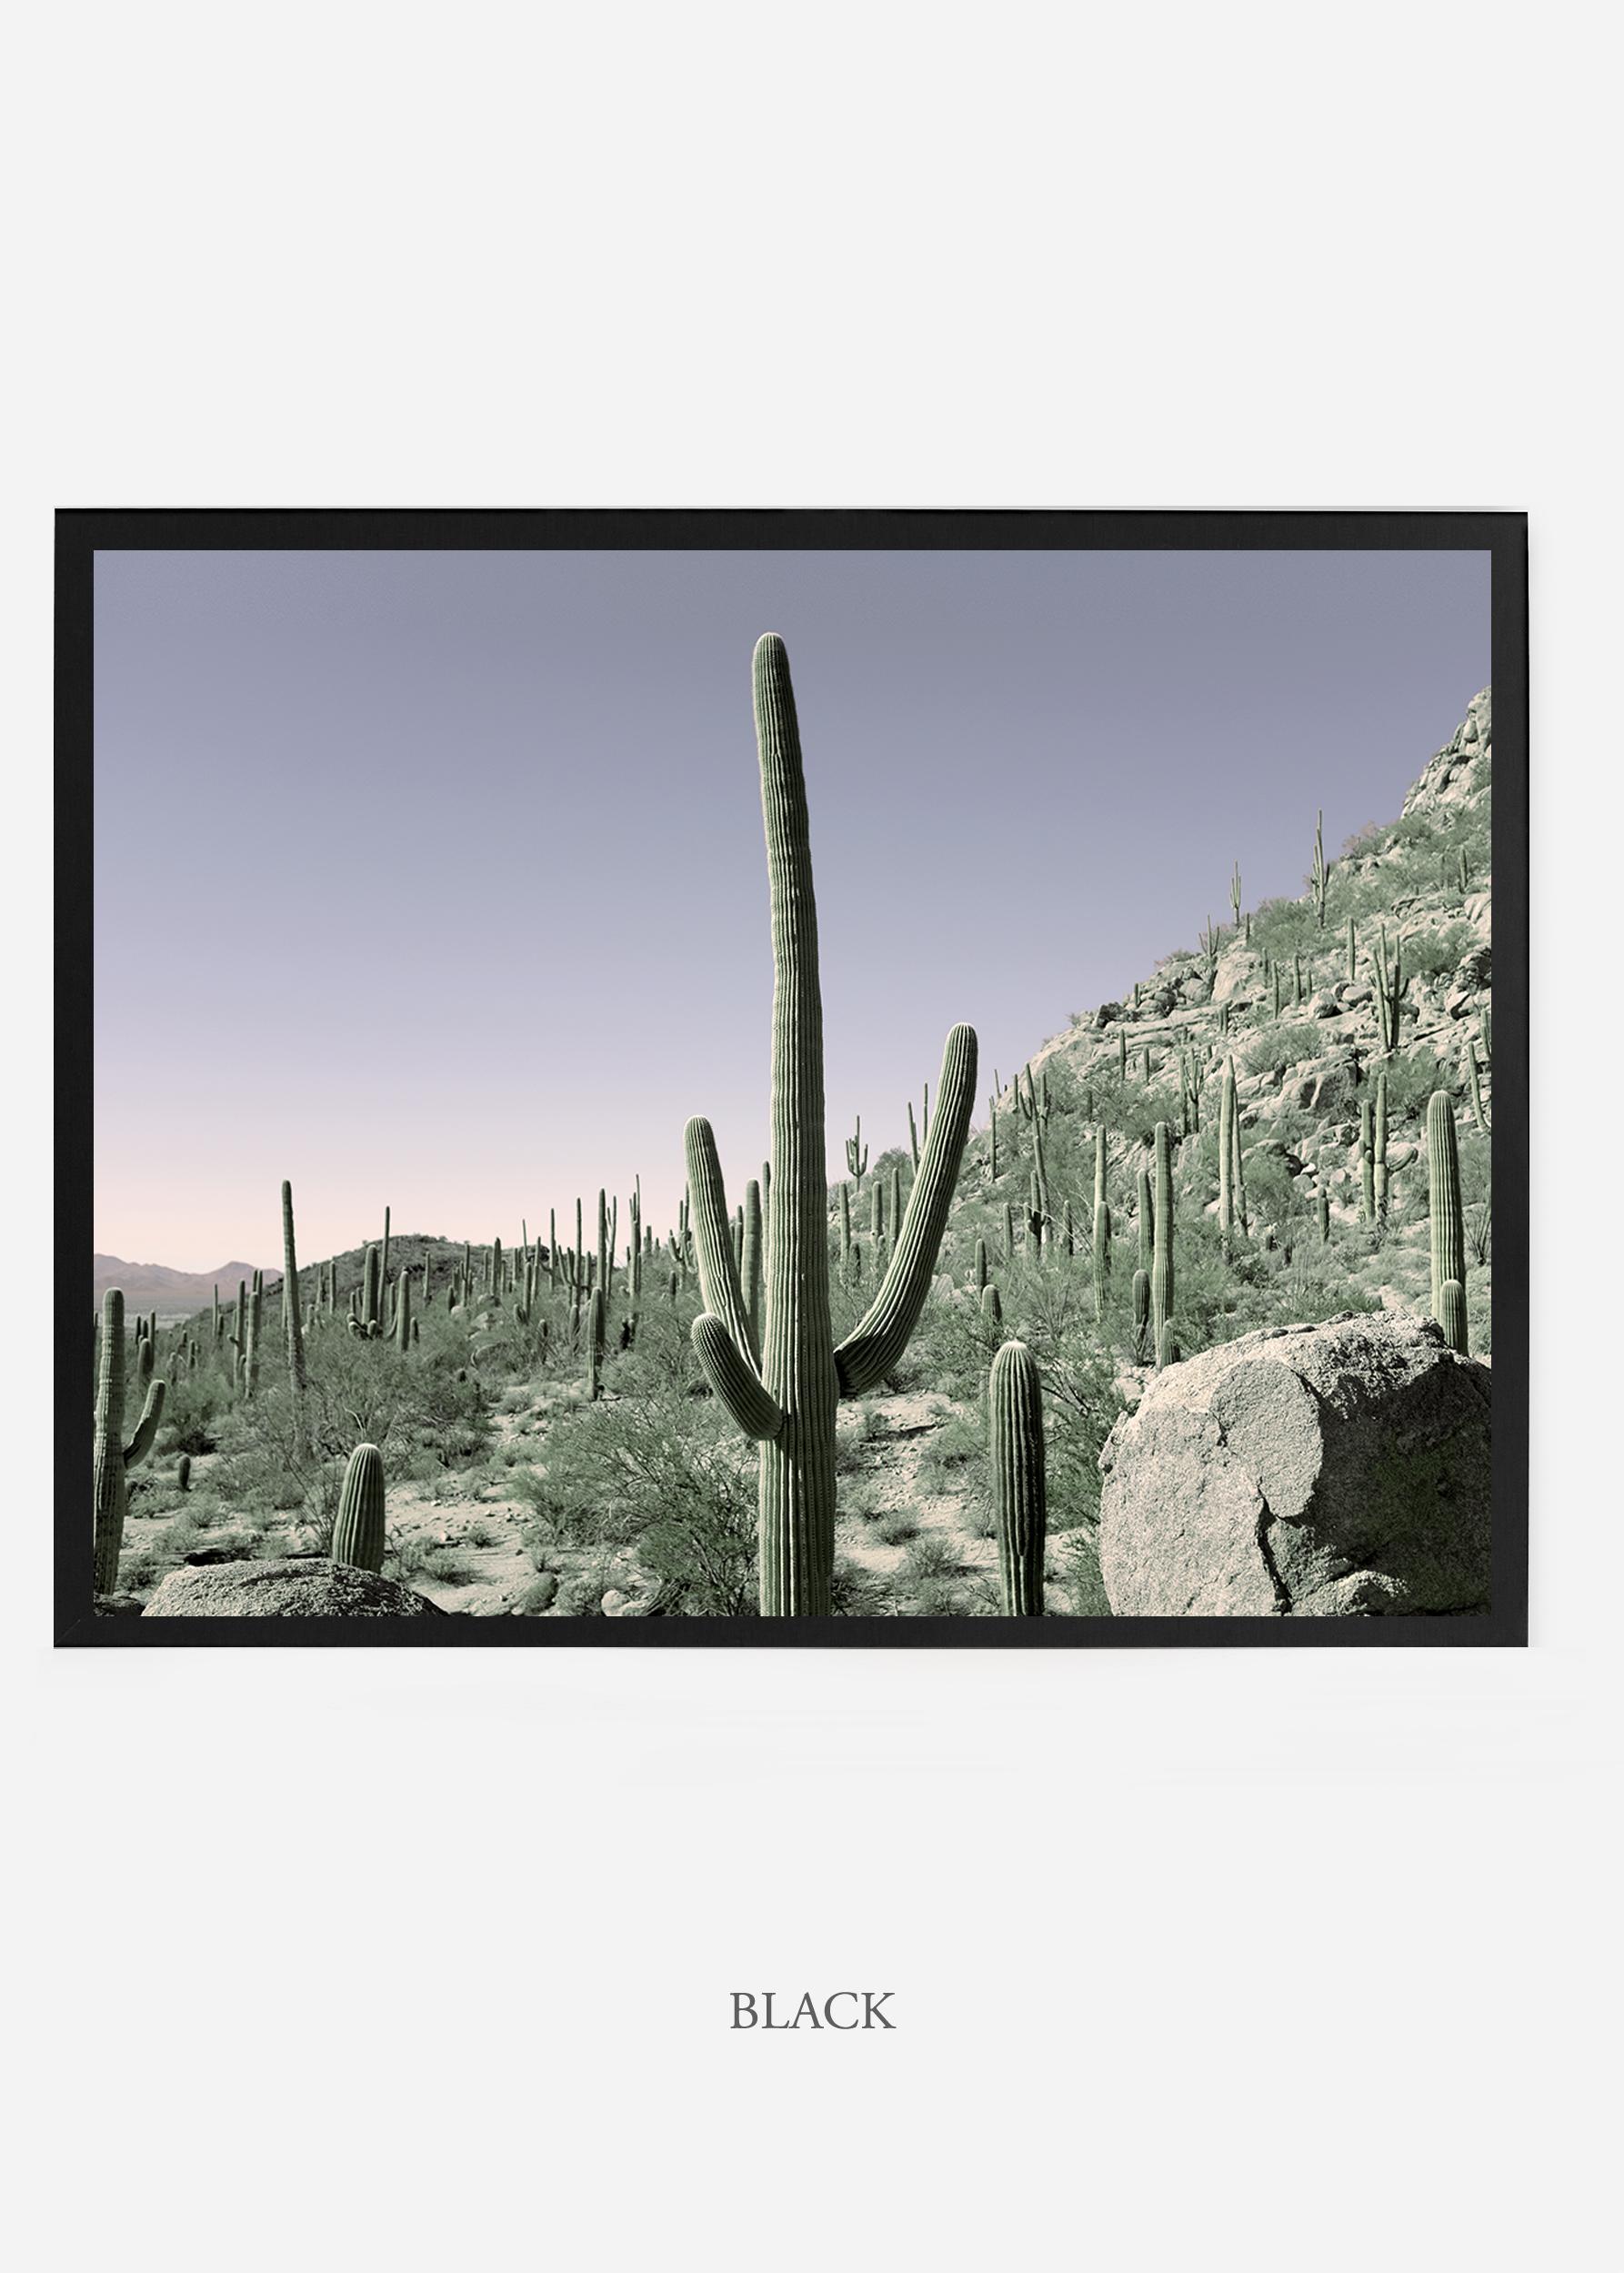 nomat_blackframe-saguaroNo.13-wildercalifornia-art-wallart-cactusprint-homedecor-prints-arizona-botanical-artwork-interiordesign.jpg